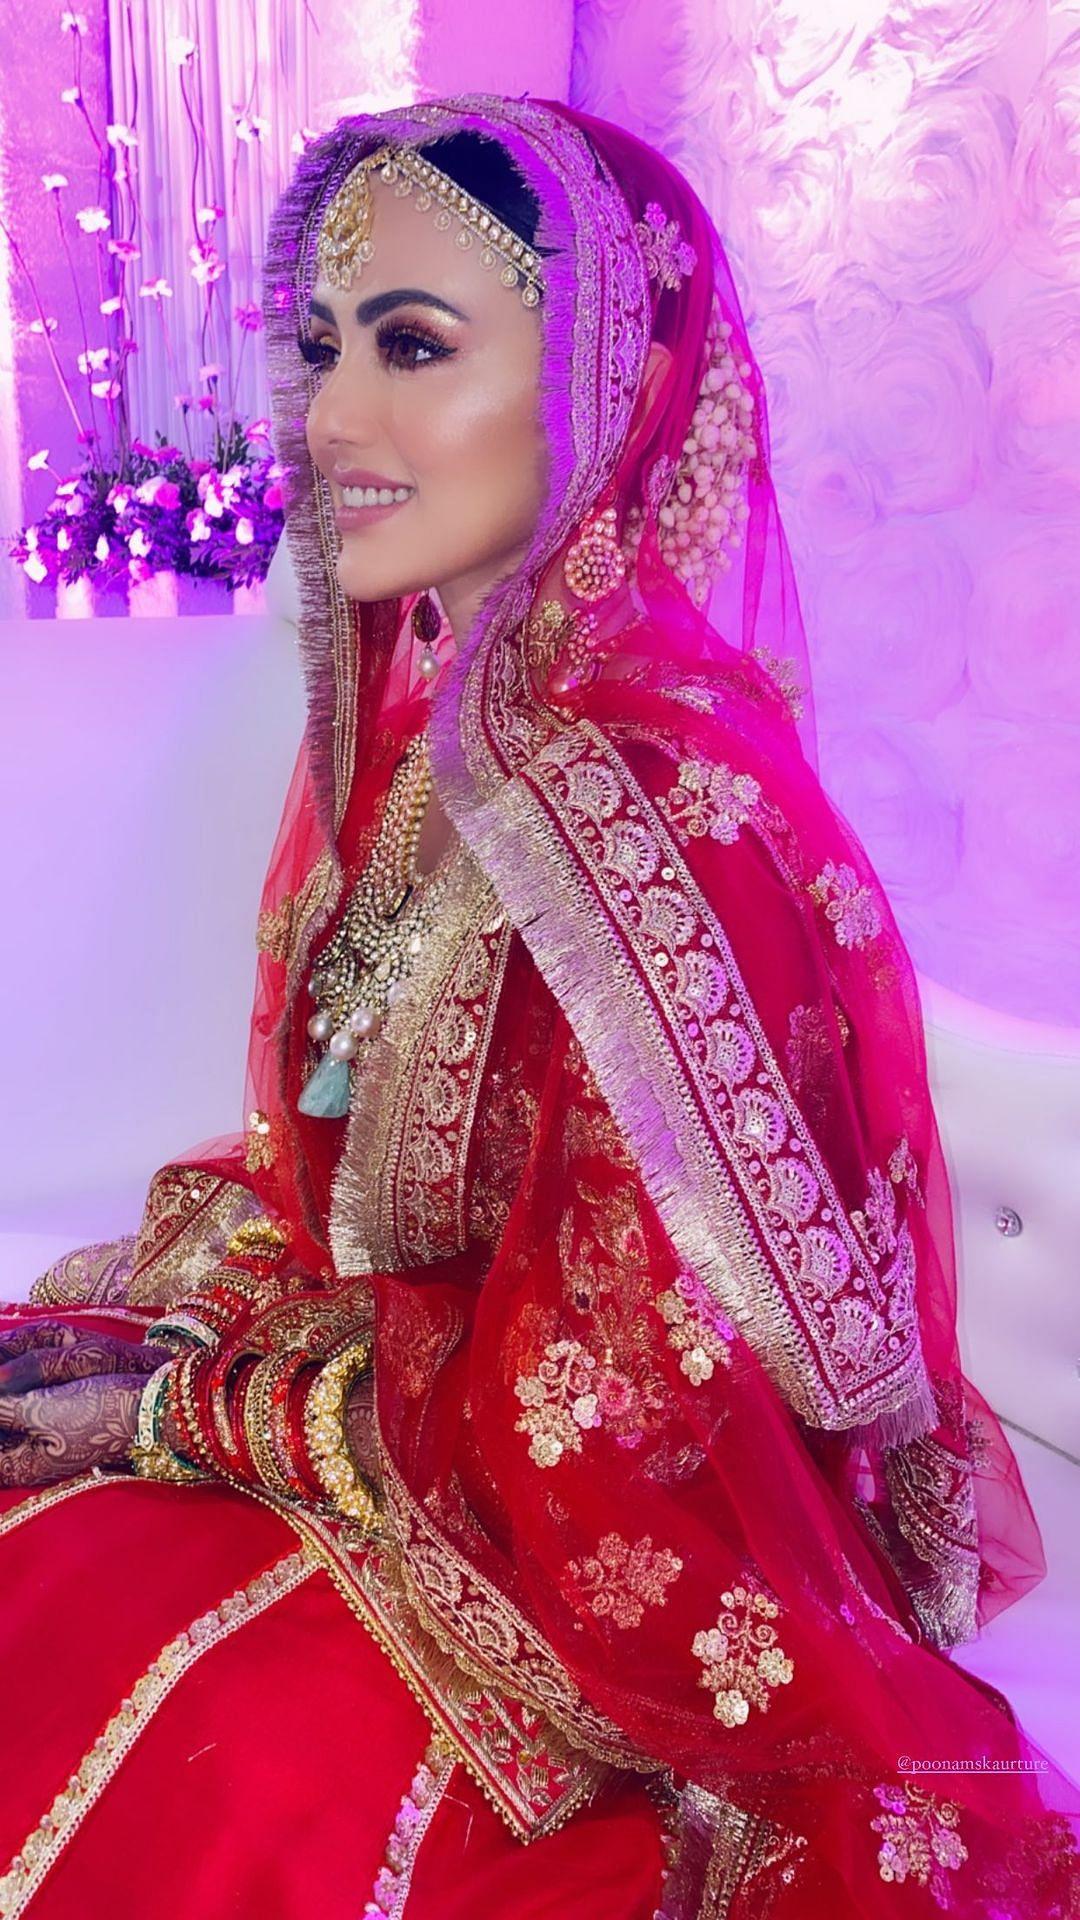 Ex-Bigg Boss Contestant Sana Khan Shares Photos From Her Wedding